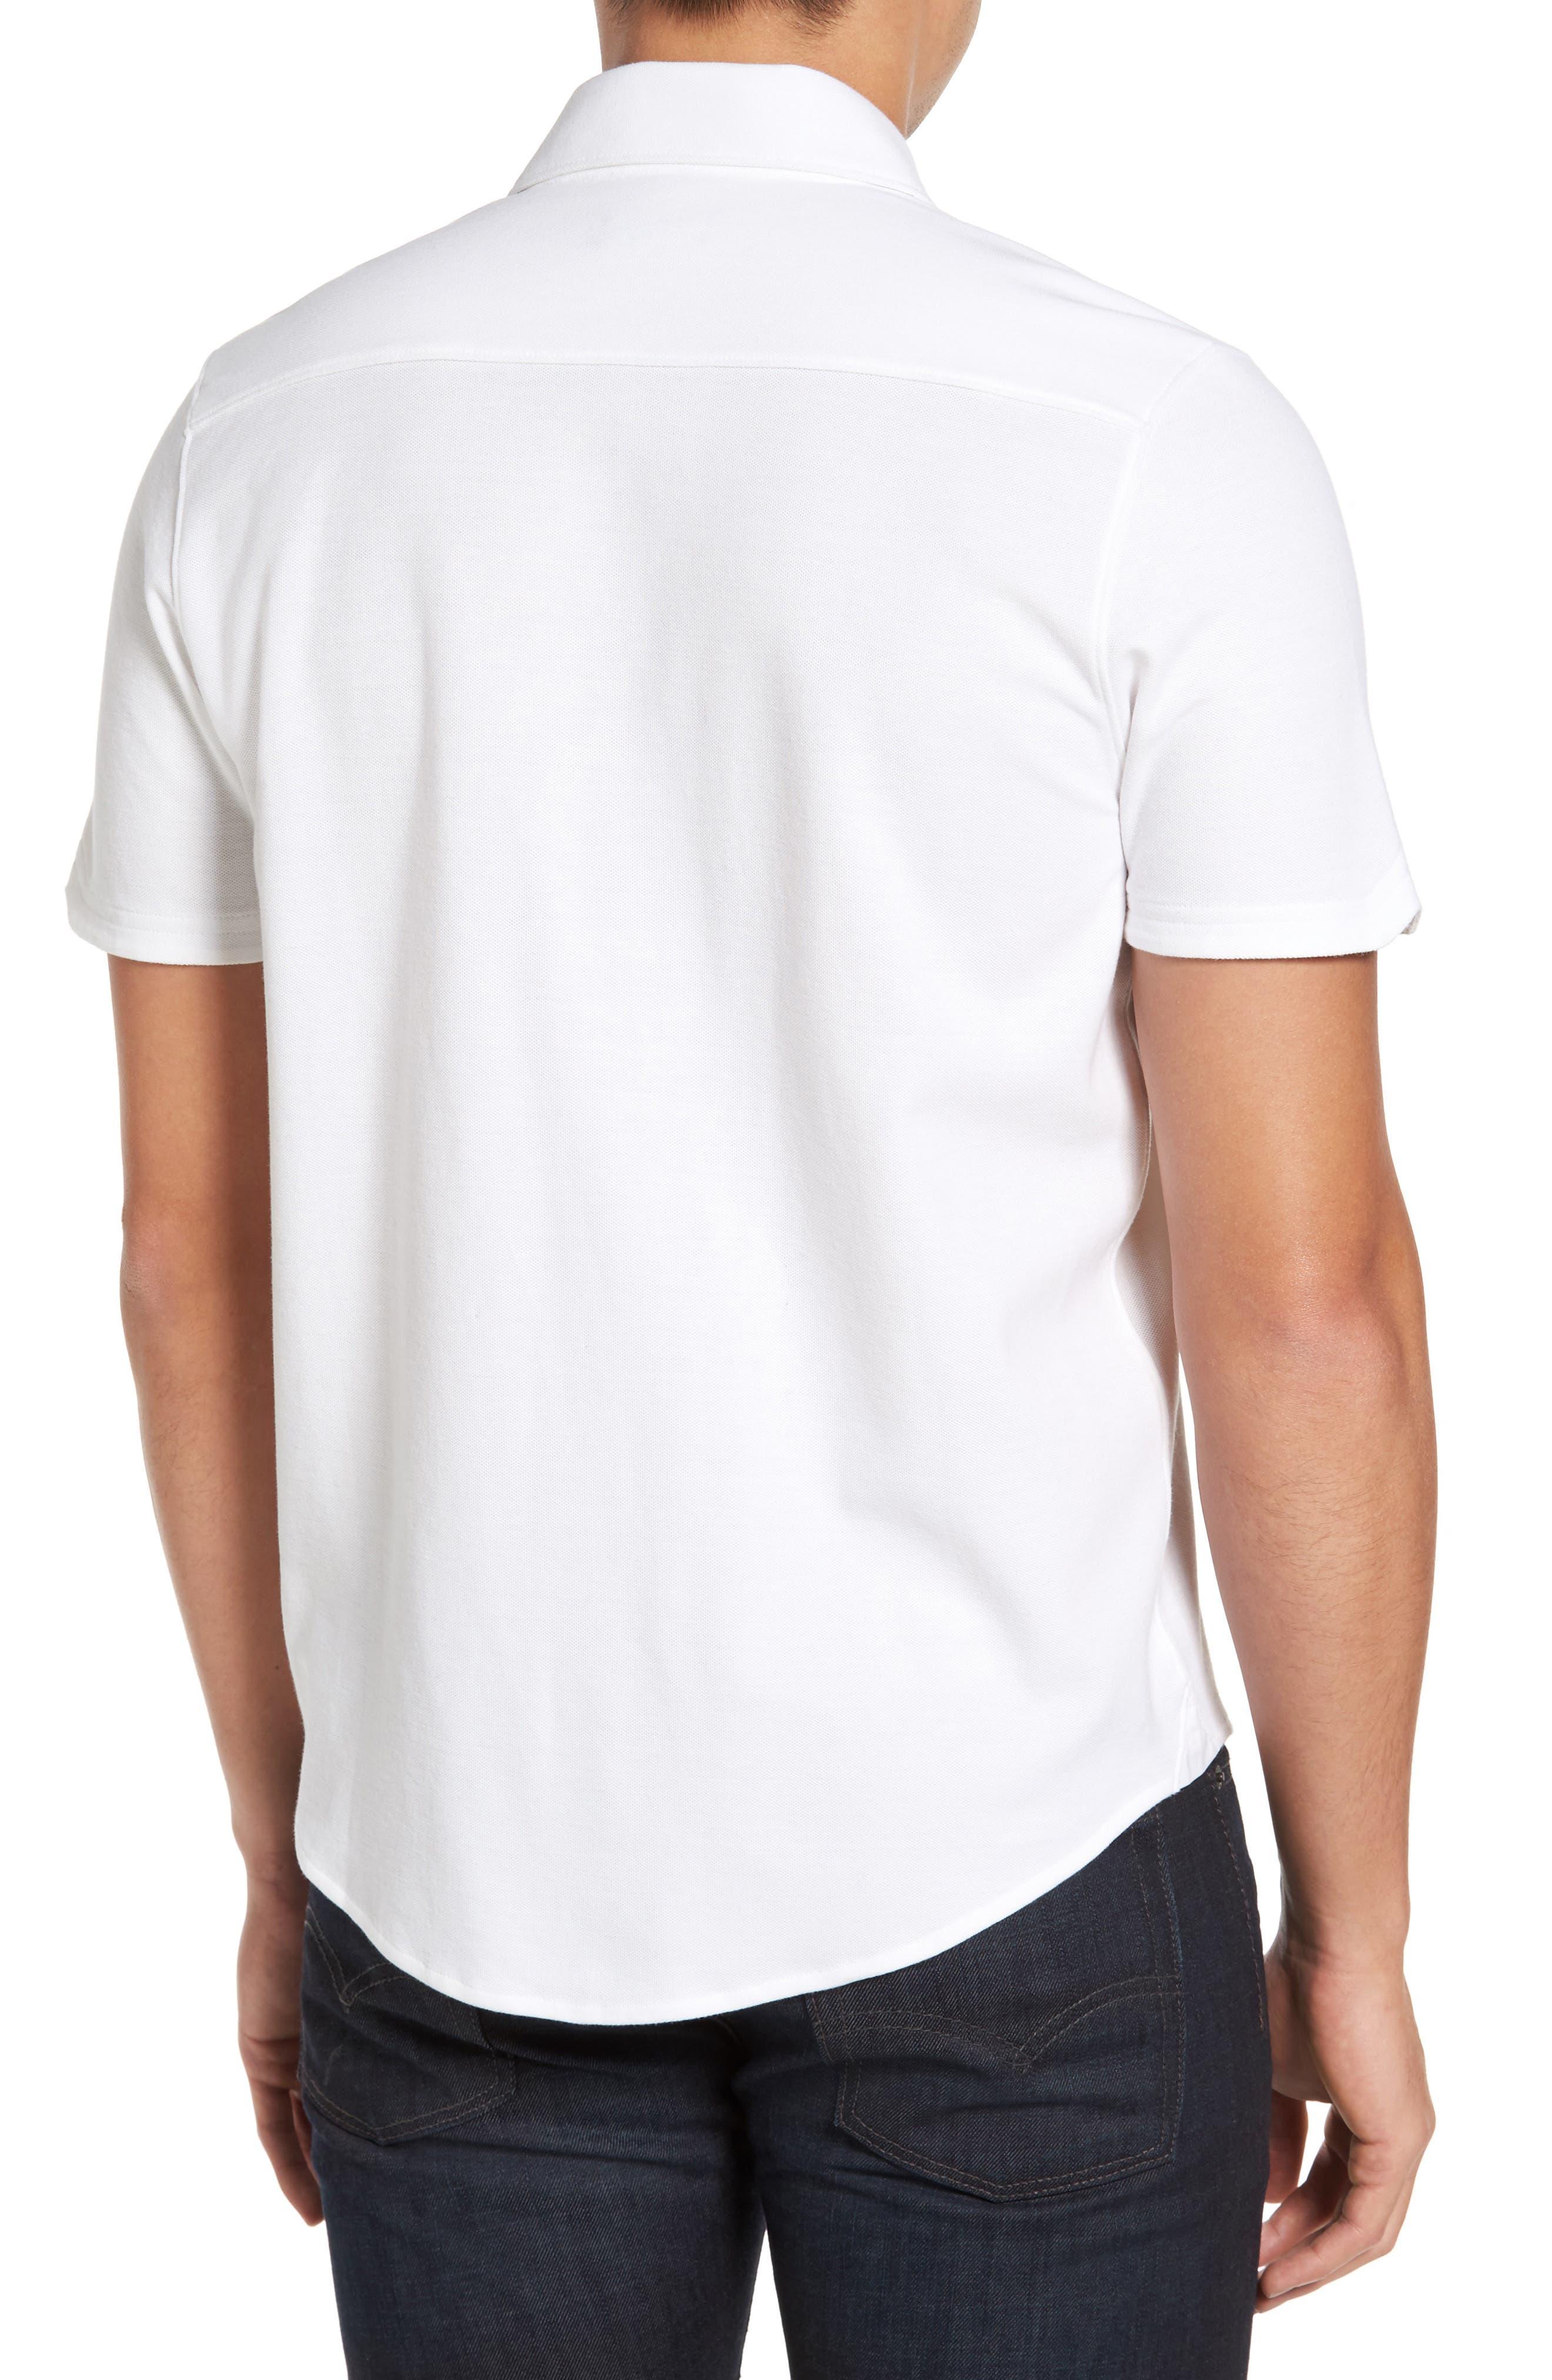 Palmetto Pima Cotton Shirt,                             Alternate thumbnail 2, color,                             White